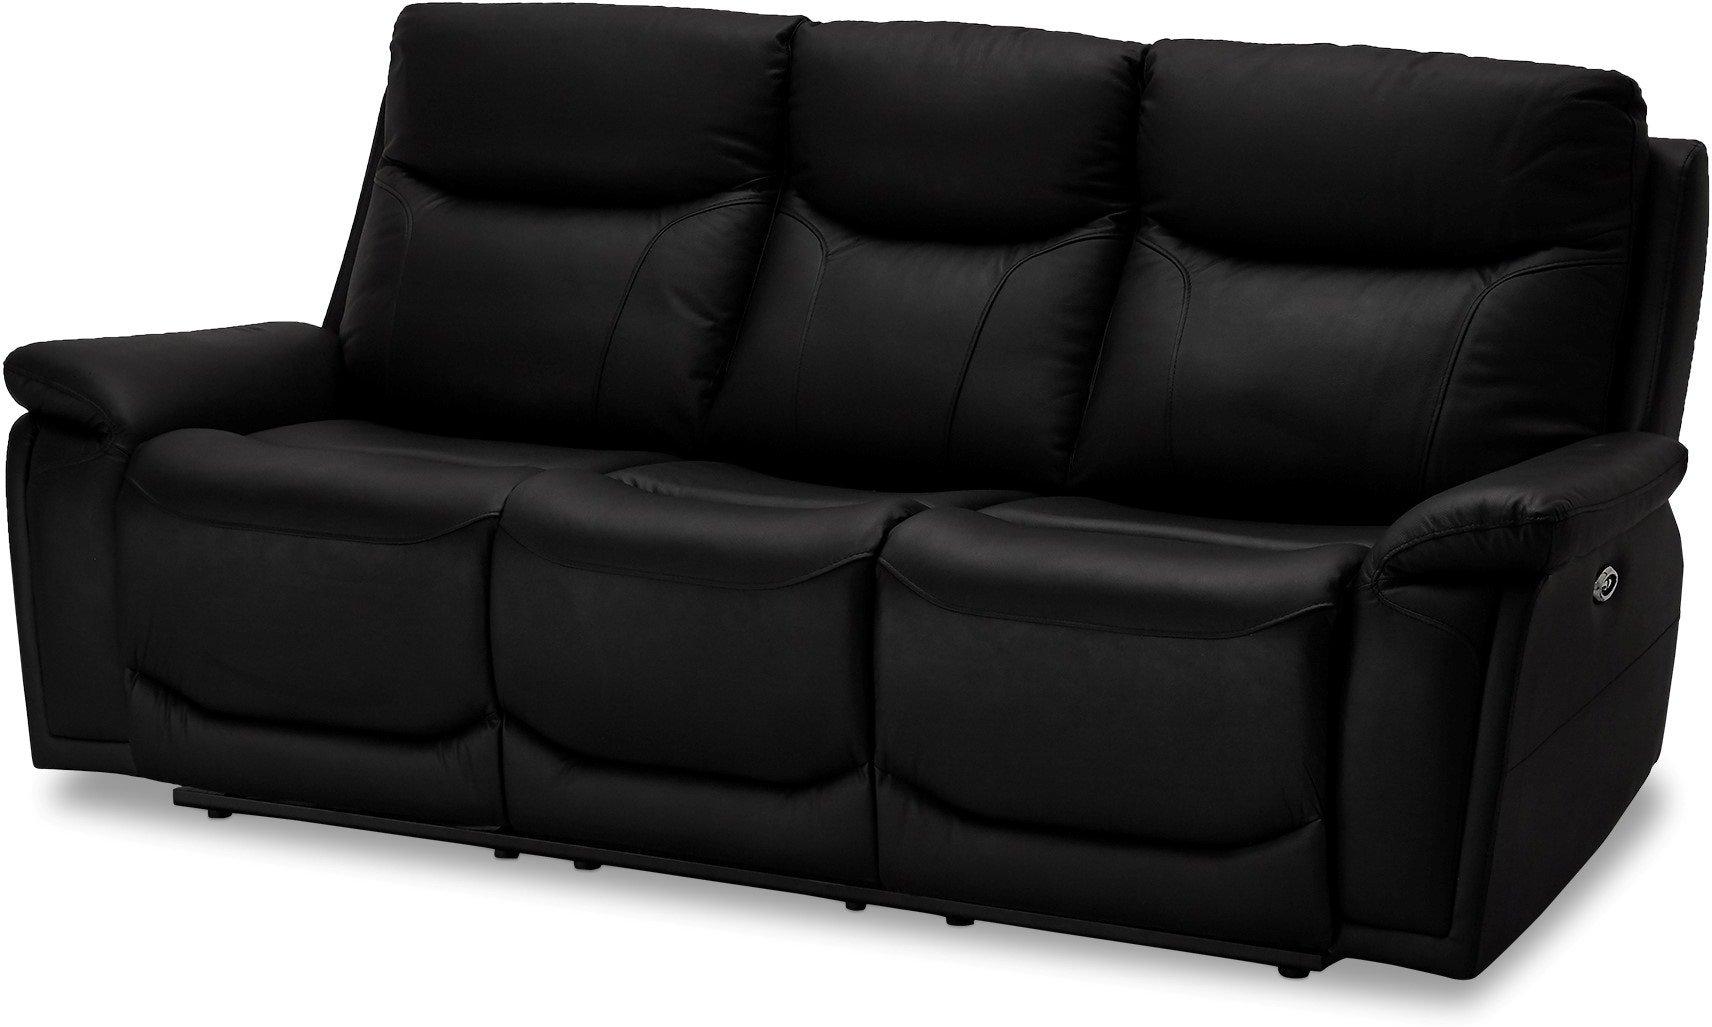 Stirling, 3-personers sofa, Ægte læder by Raymond & Hallmark (H: 100 cm. B: 217 cm. L: 99 cm., Sort)